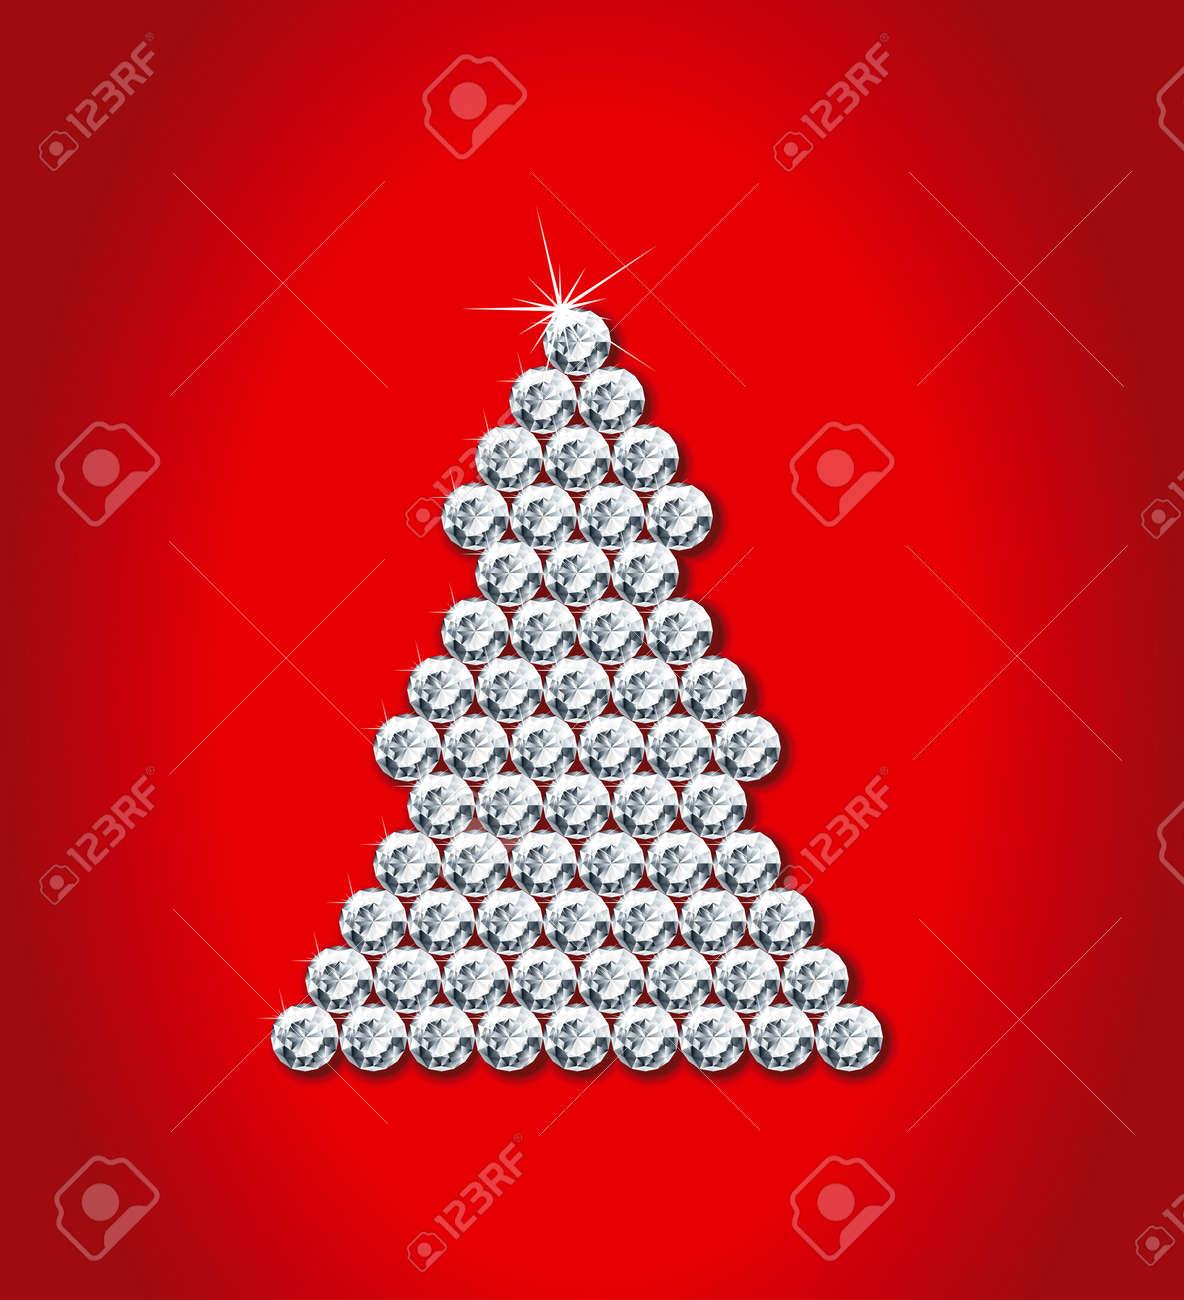 Diamond christmas tree  Vector illustration of christmas decoration with diamond glamour fir tree Stock Vector - 23284684